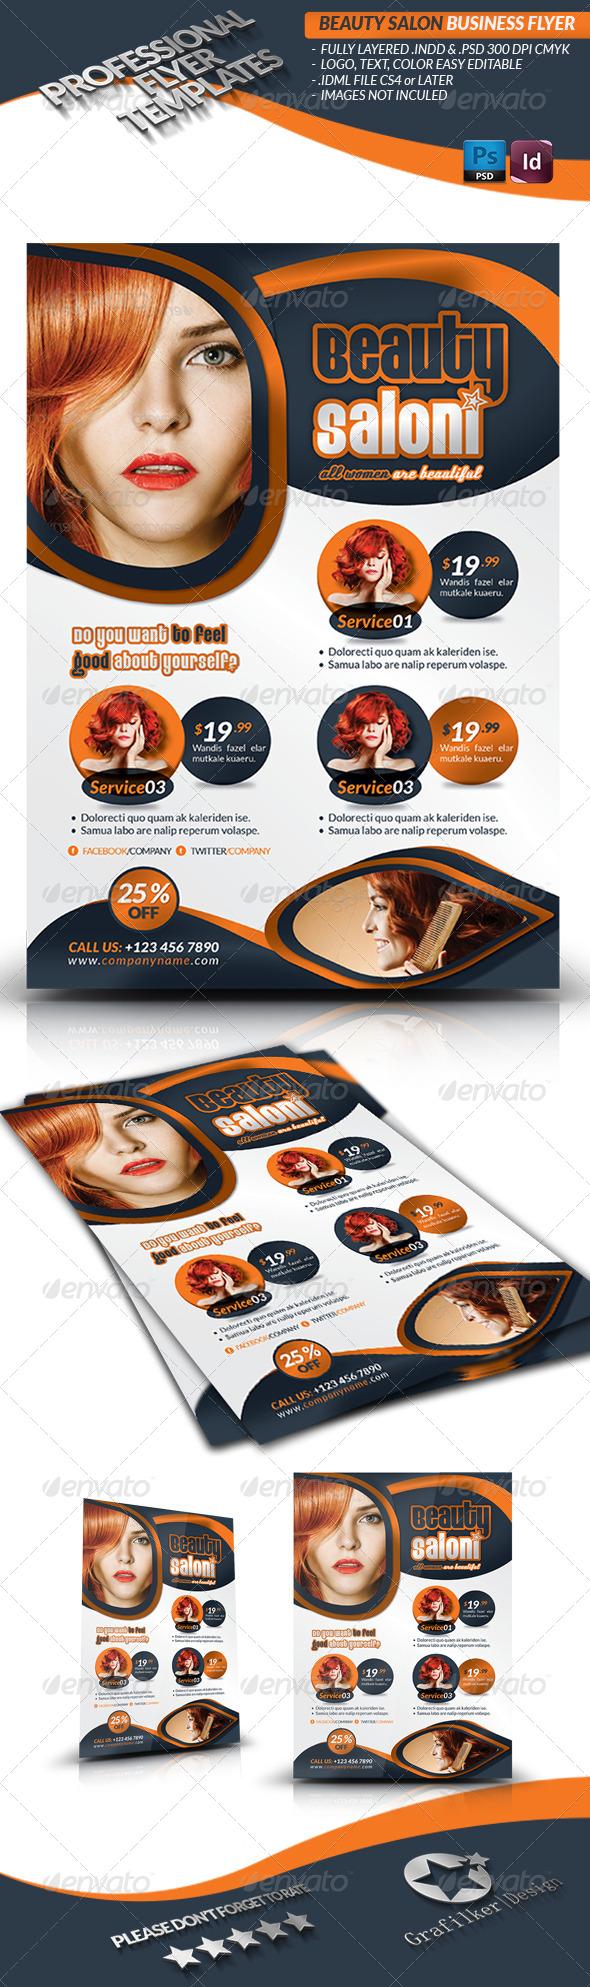 Beauty Salon Flyer Template - Corporate Flyers